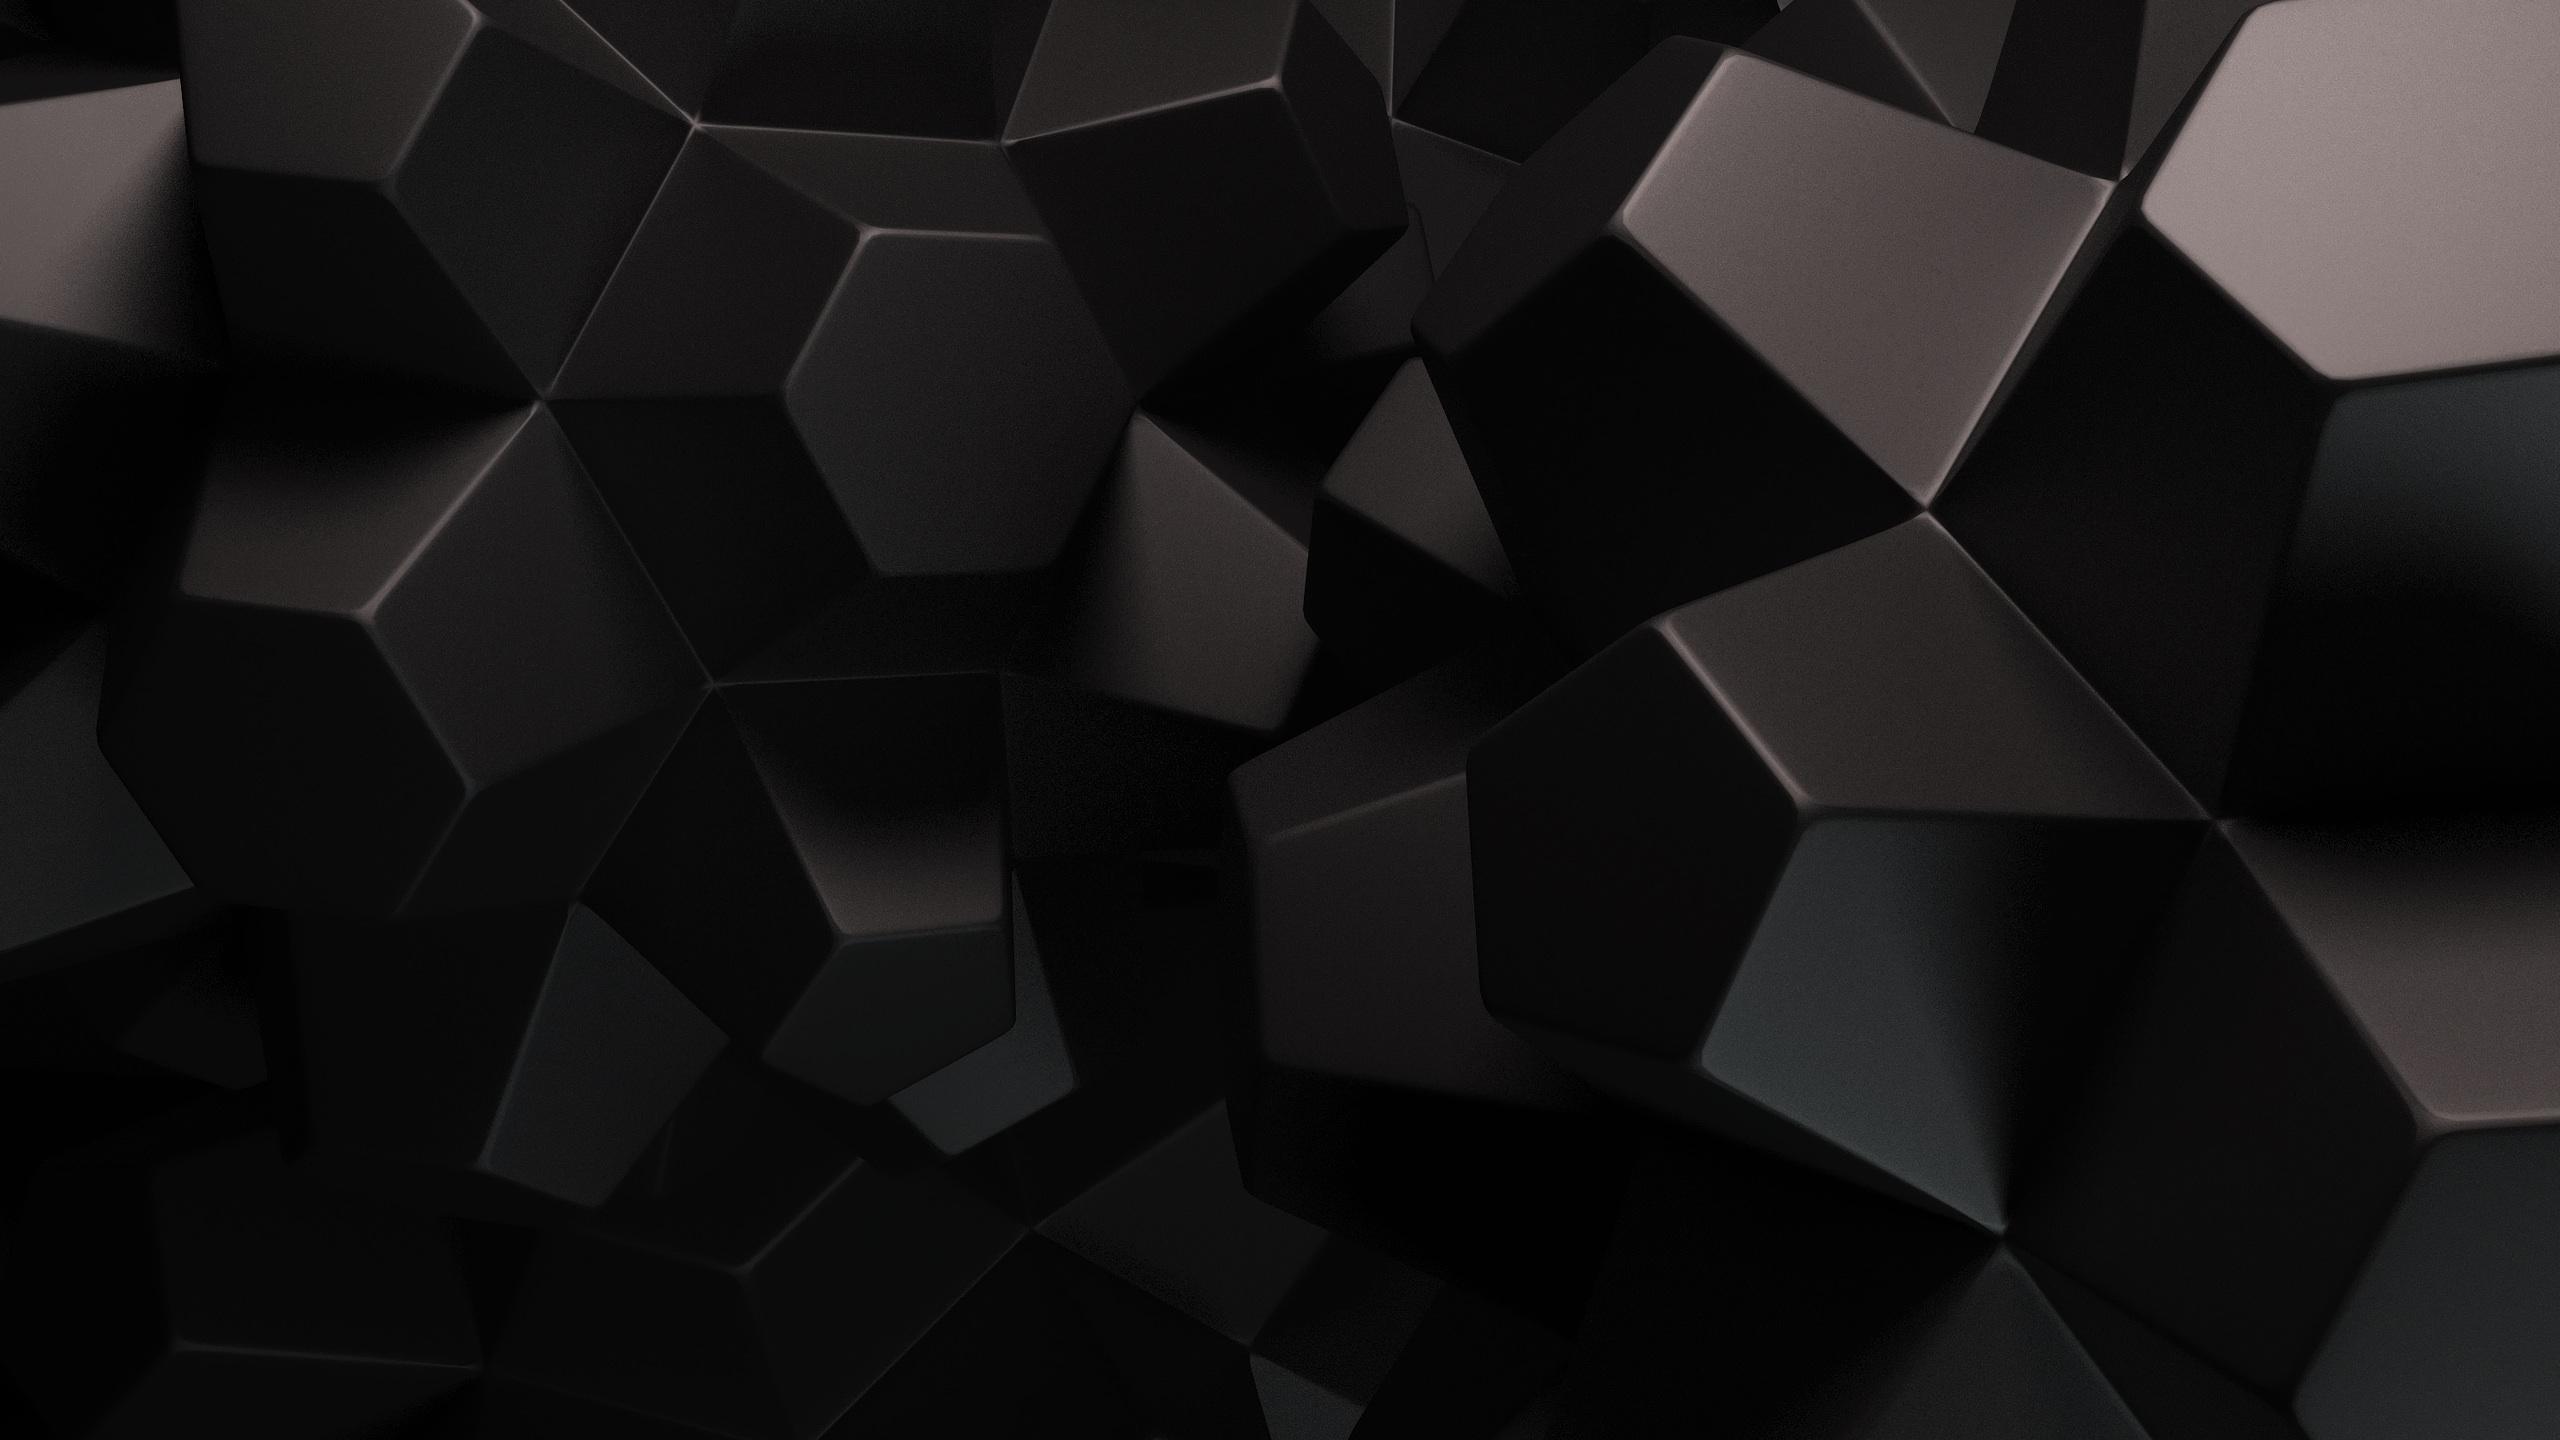 2560x1440 Abstract Black Shapes desktop PC and Mac wallpaper 2560x1440